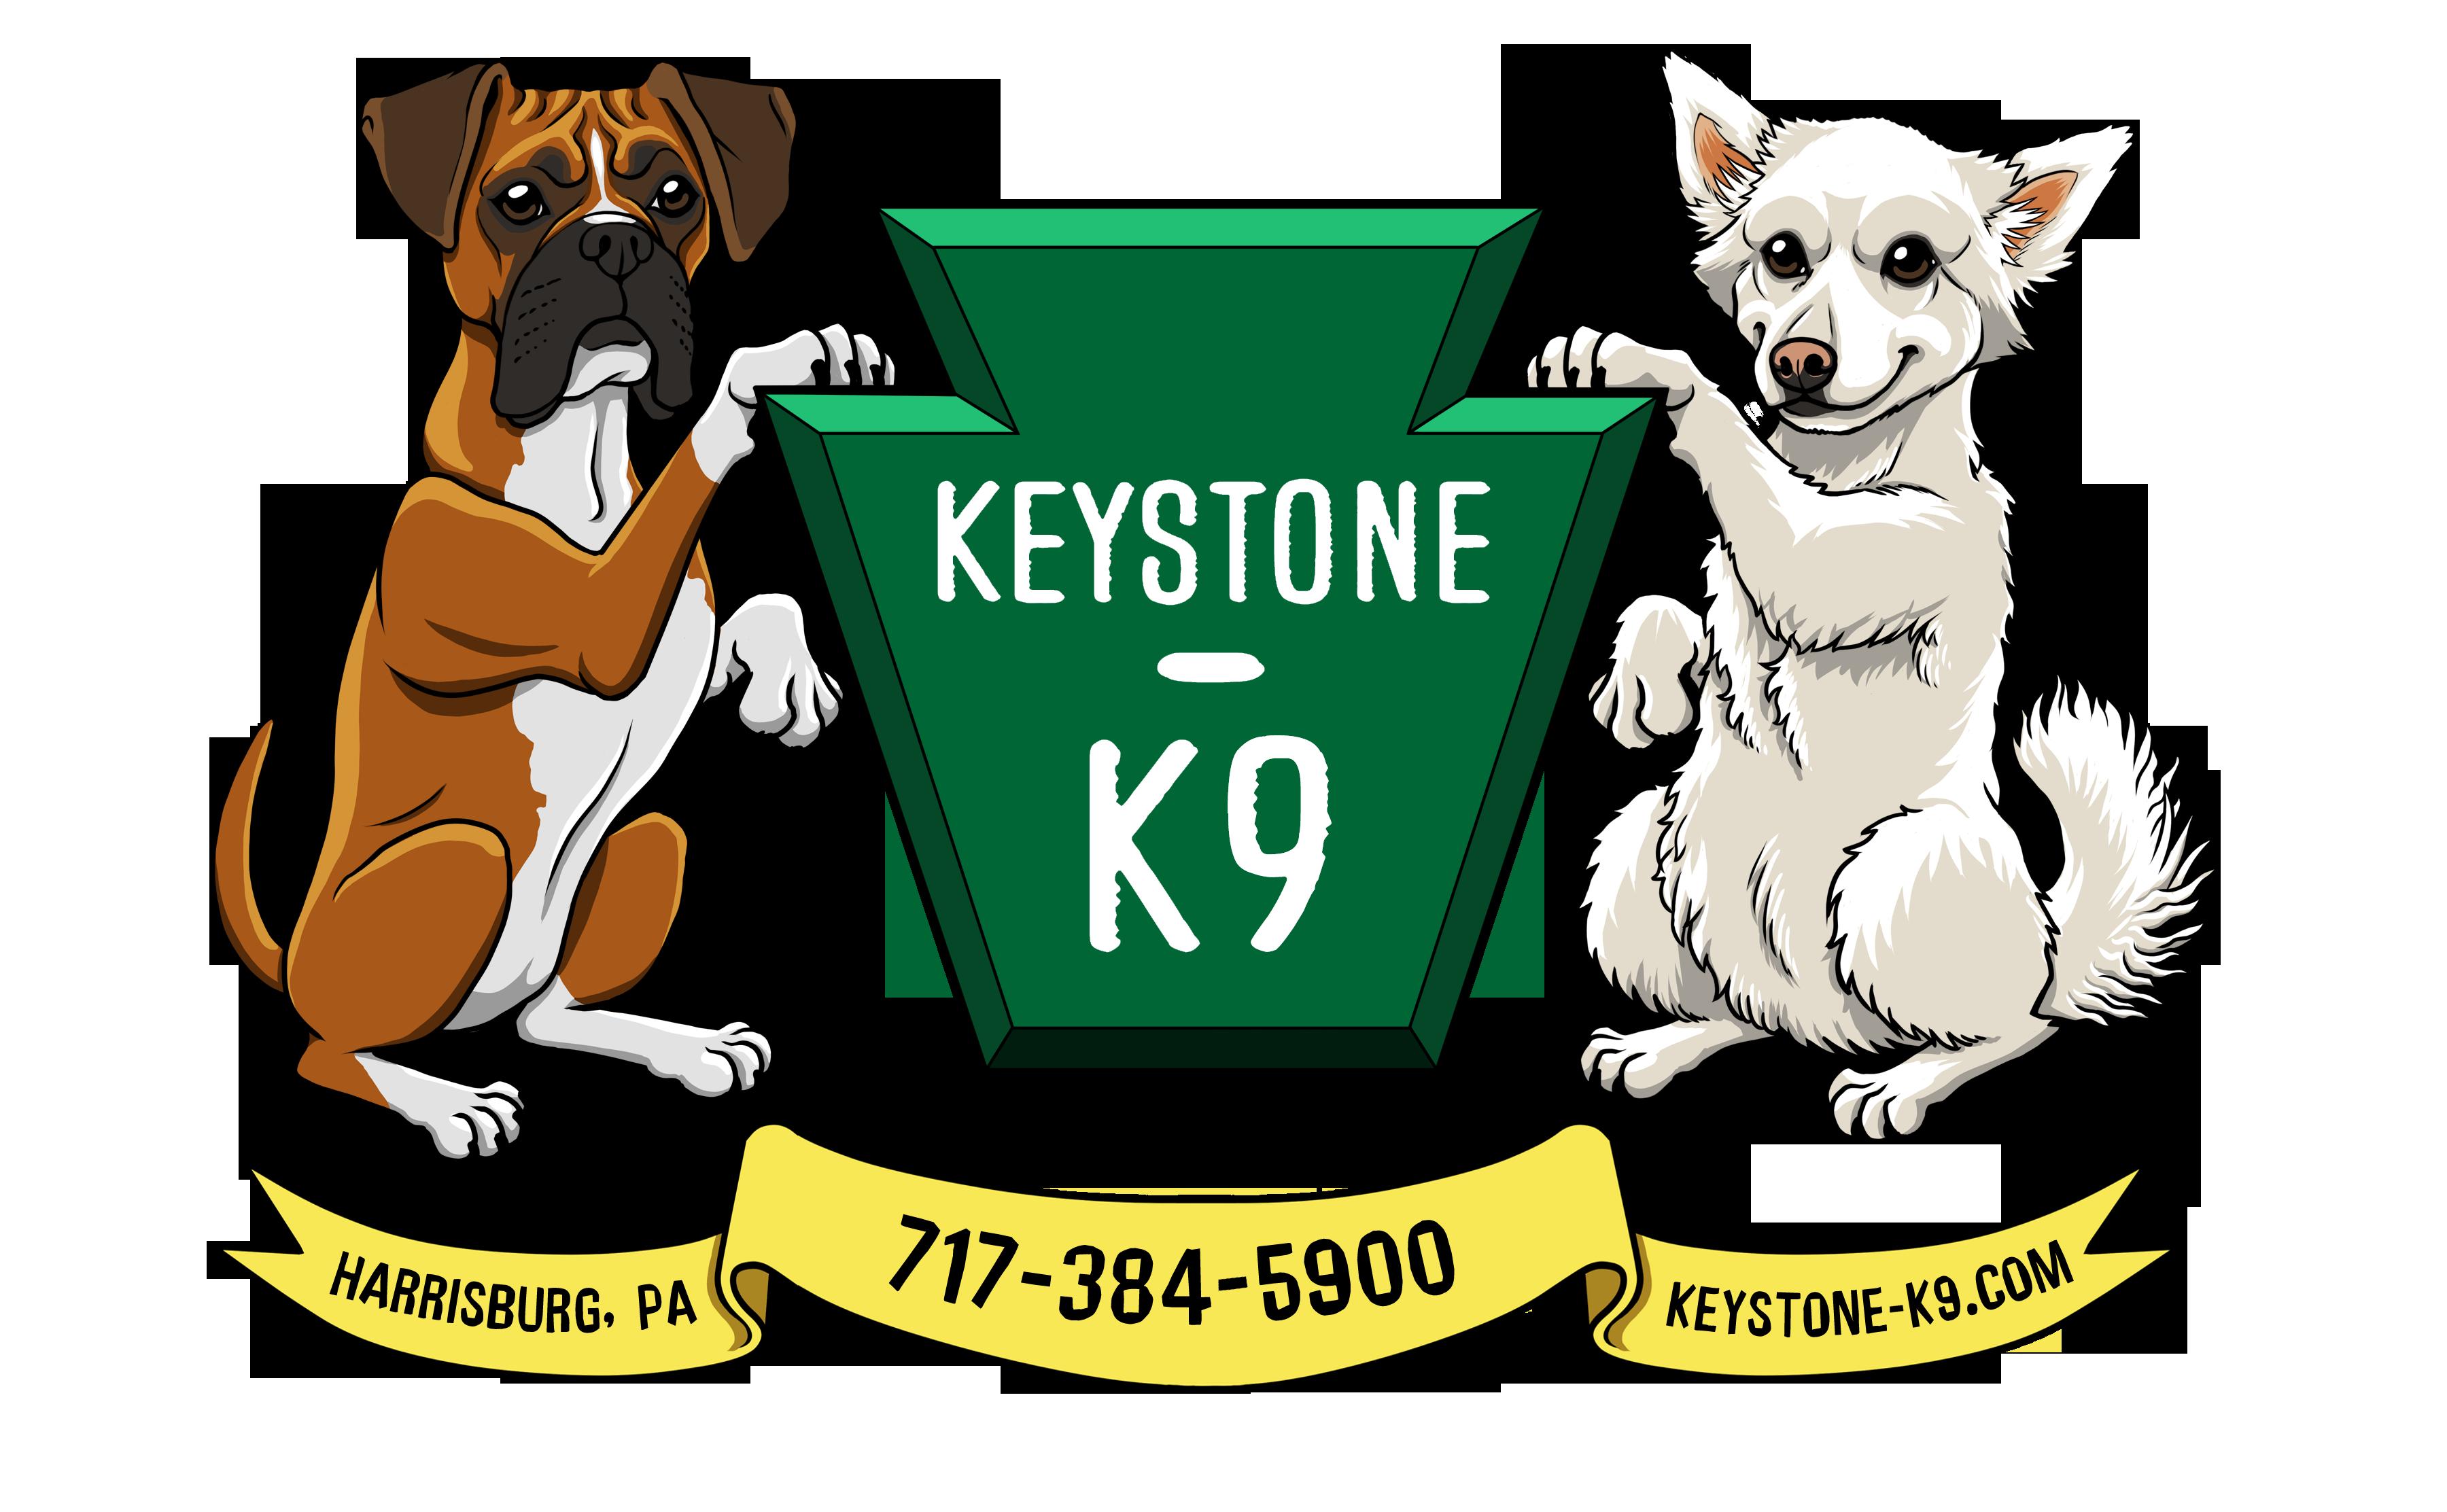 keystone k9 logo final.png